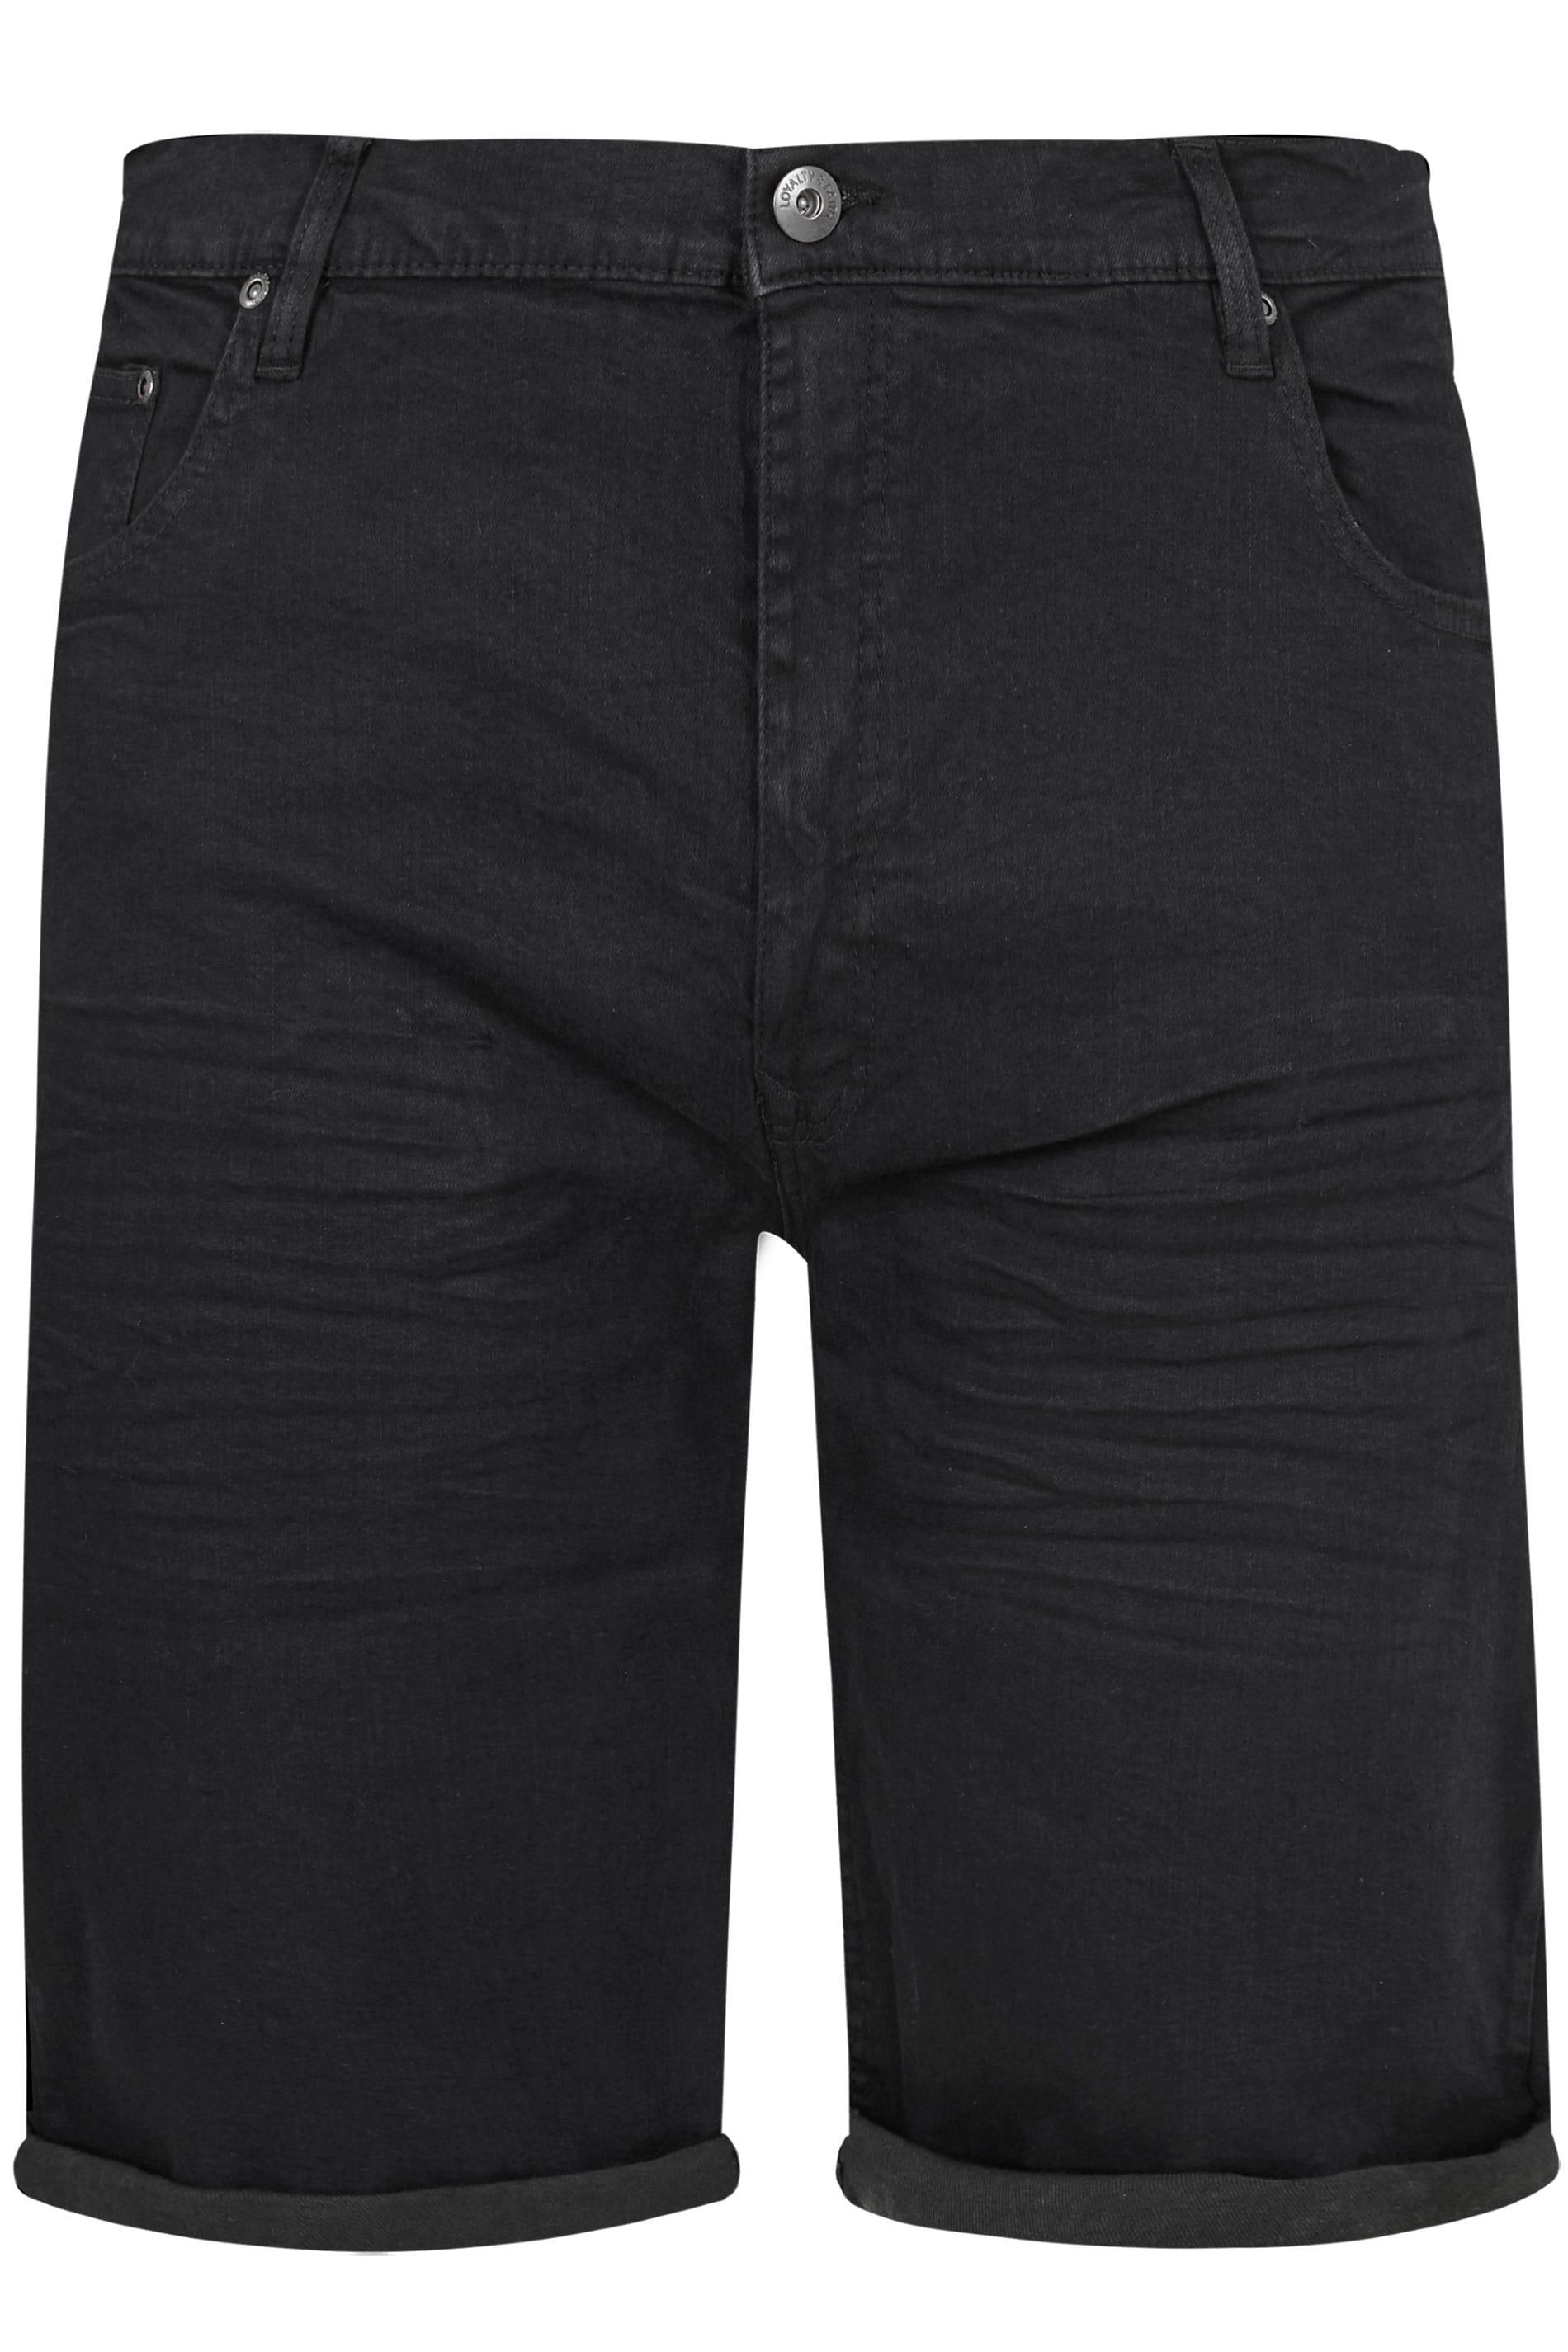 LOYALTY & FAITH Black Straight Leg Shorts